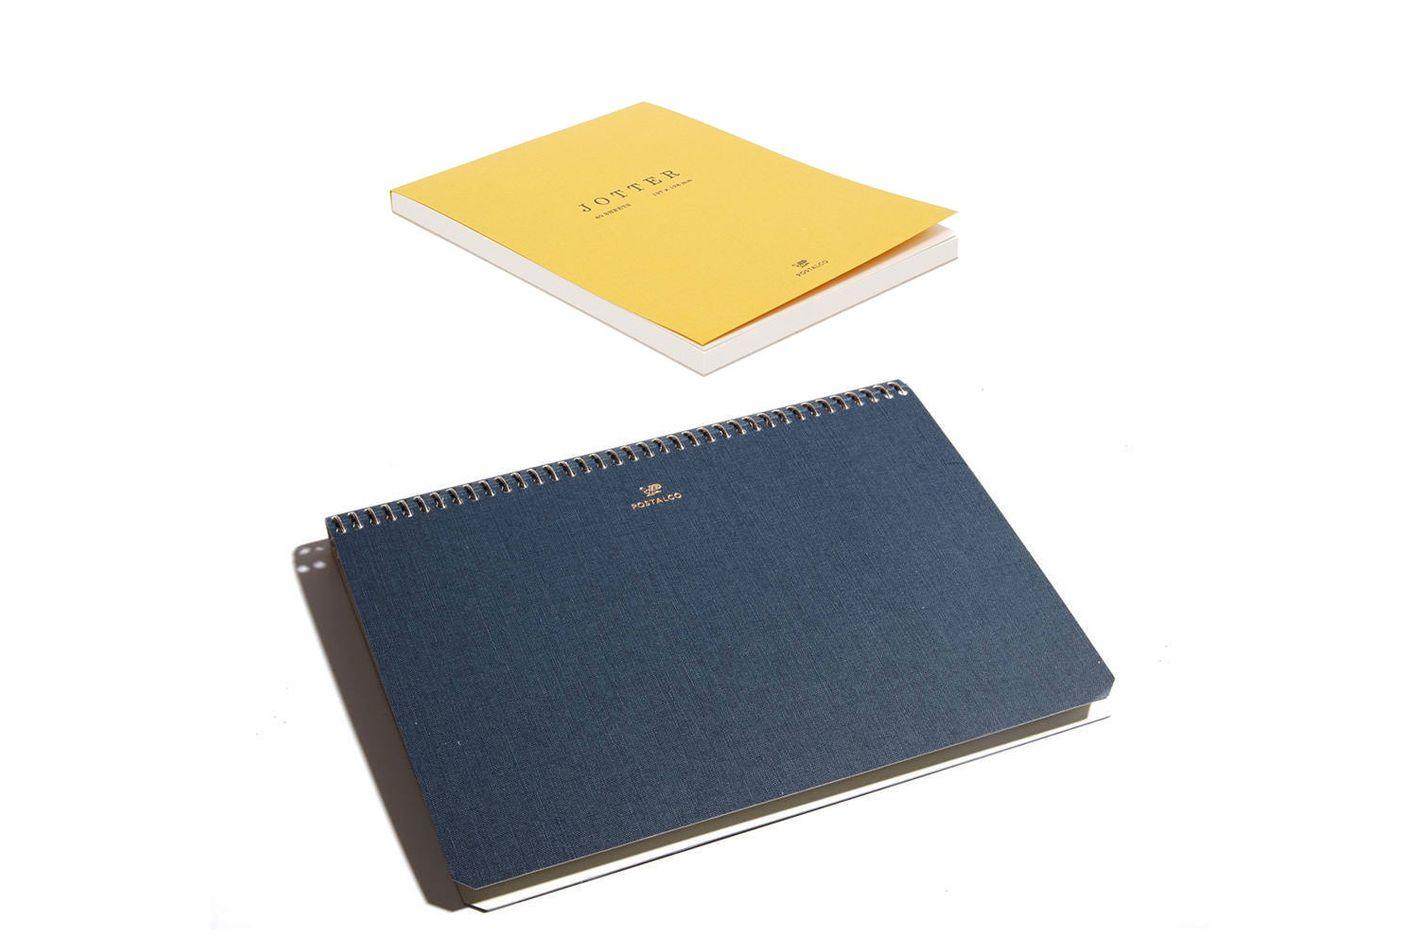 Postalco A5 Notebook